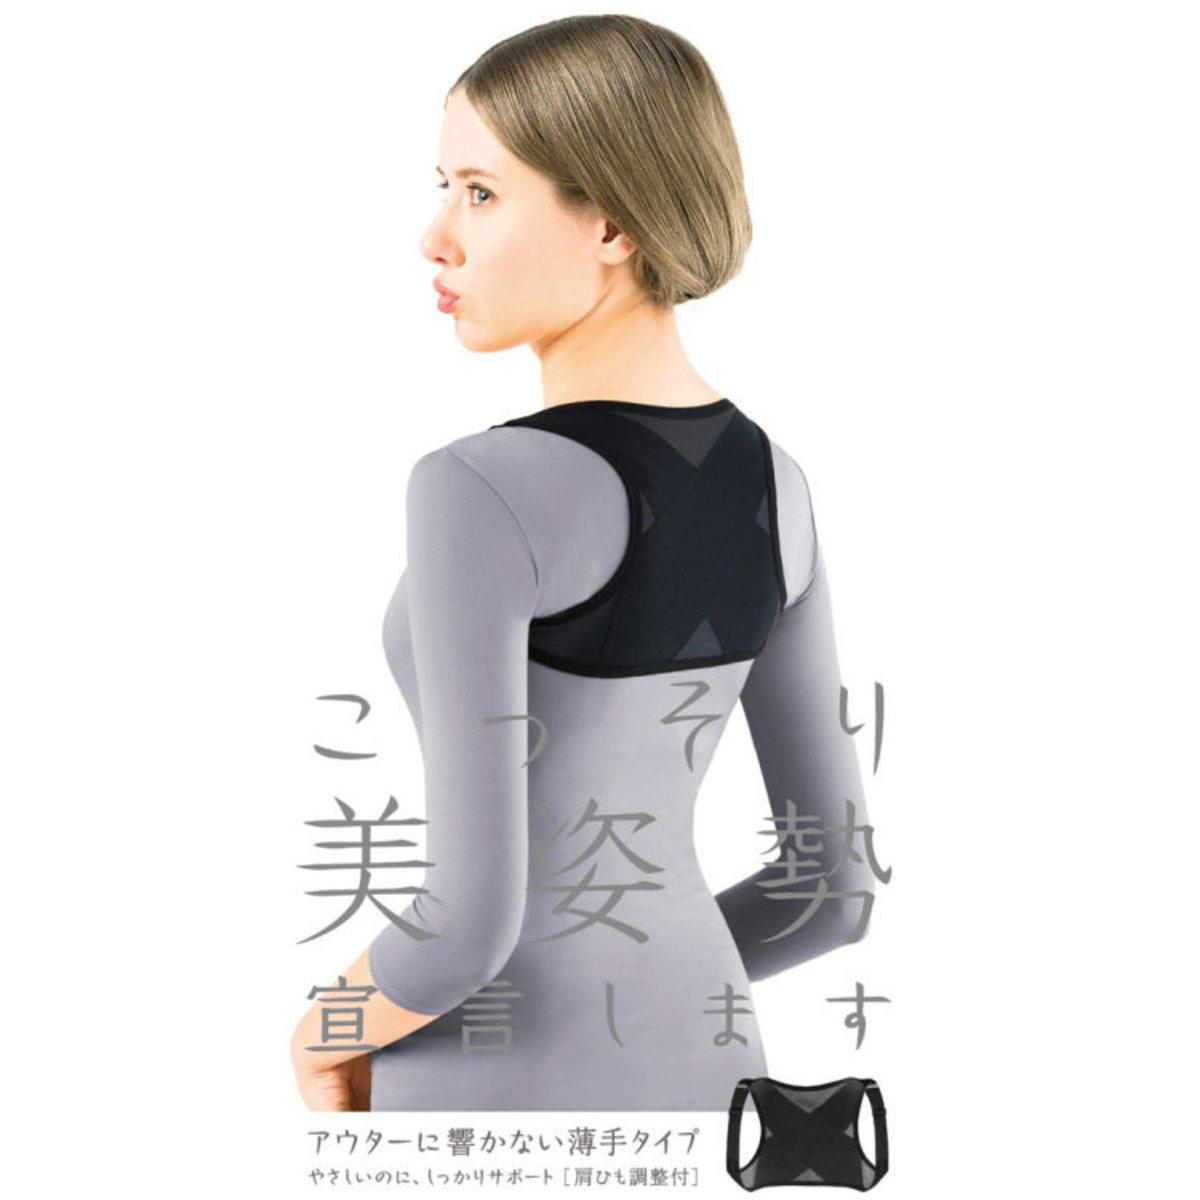 La.VIE Japanese posture belt(Small S/M)